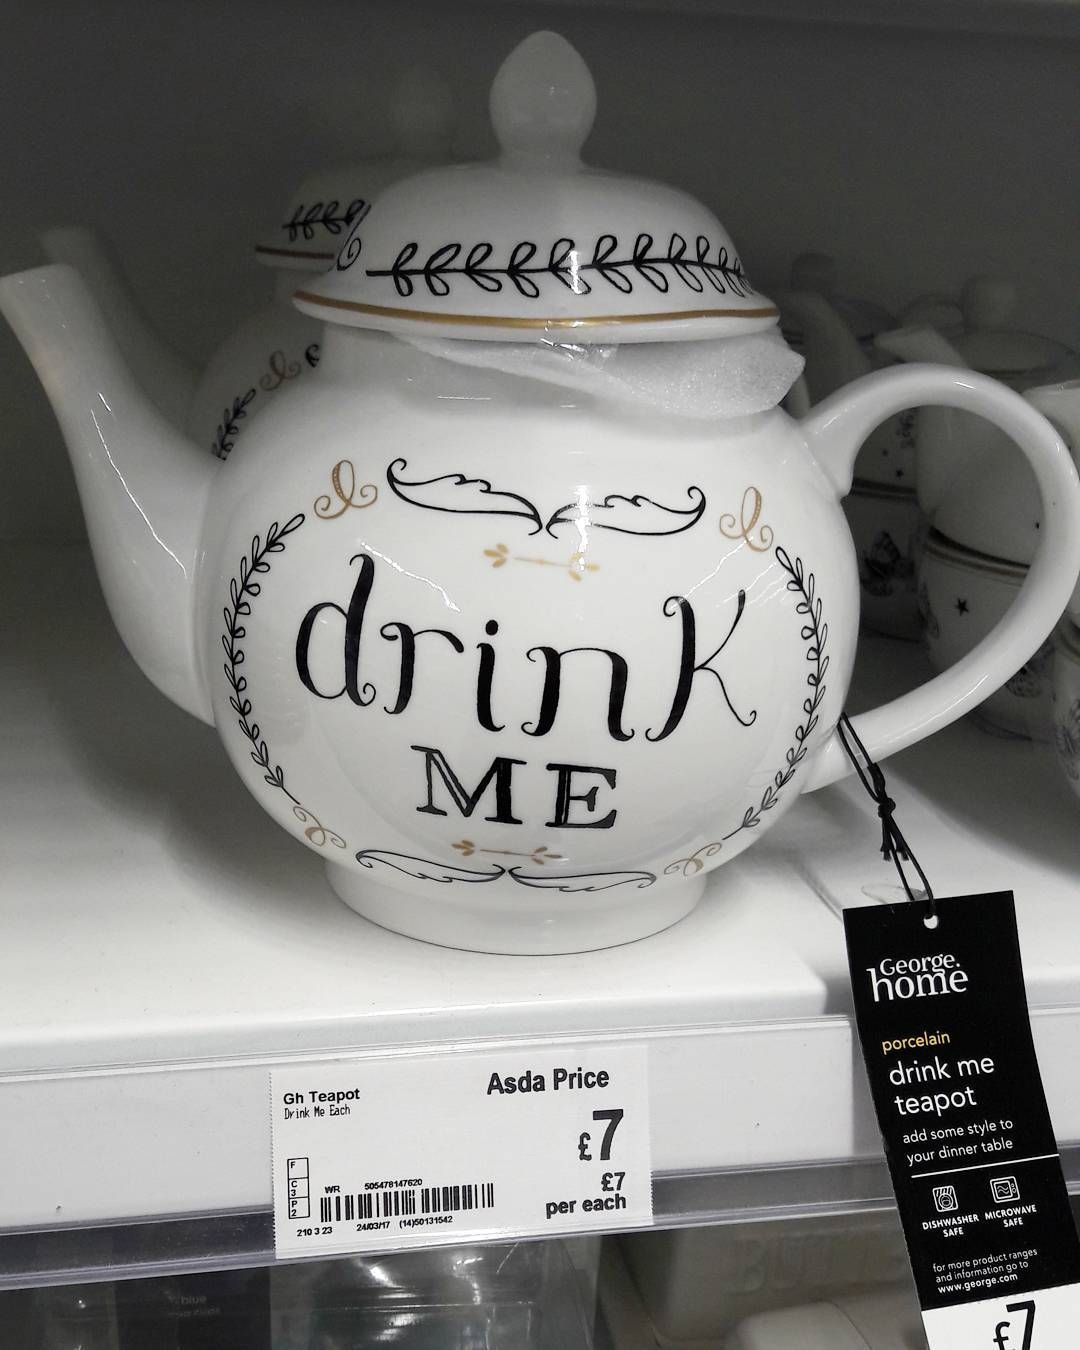 Alice In Wonderland Inspired Teapot From Asda Disney Disneygram Disneystyle Disneyhome Disneycollection Aliceinwonderland Tea Pots Porcelain Teapot Tea